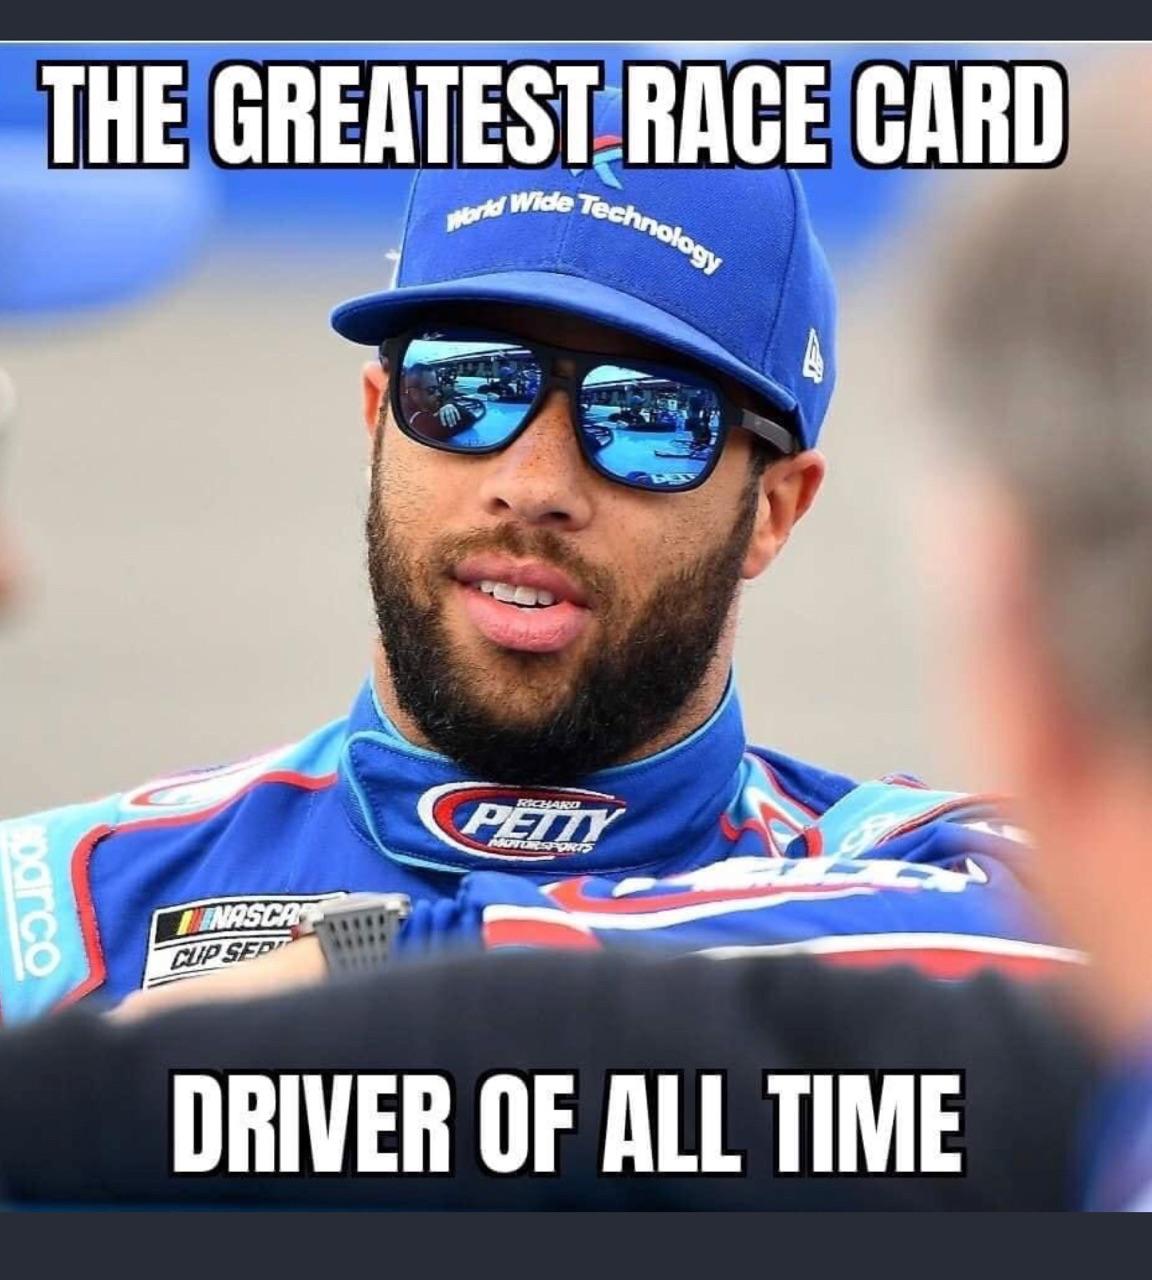 RACE CARD DRIVER.jpeg